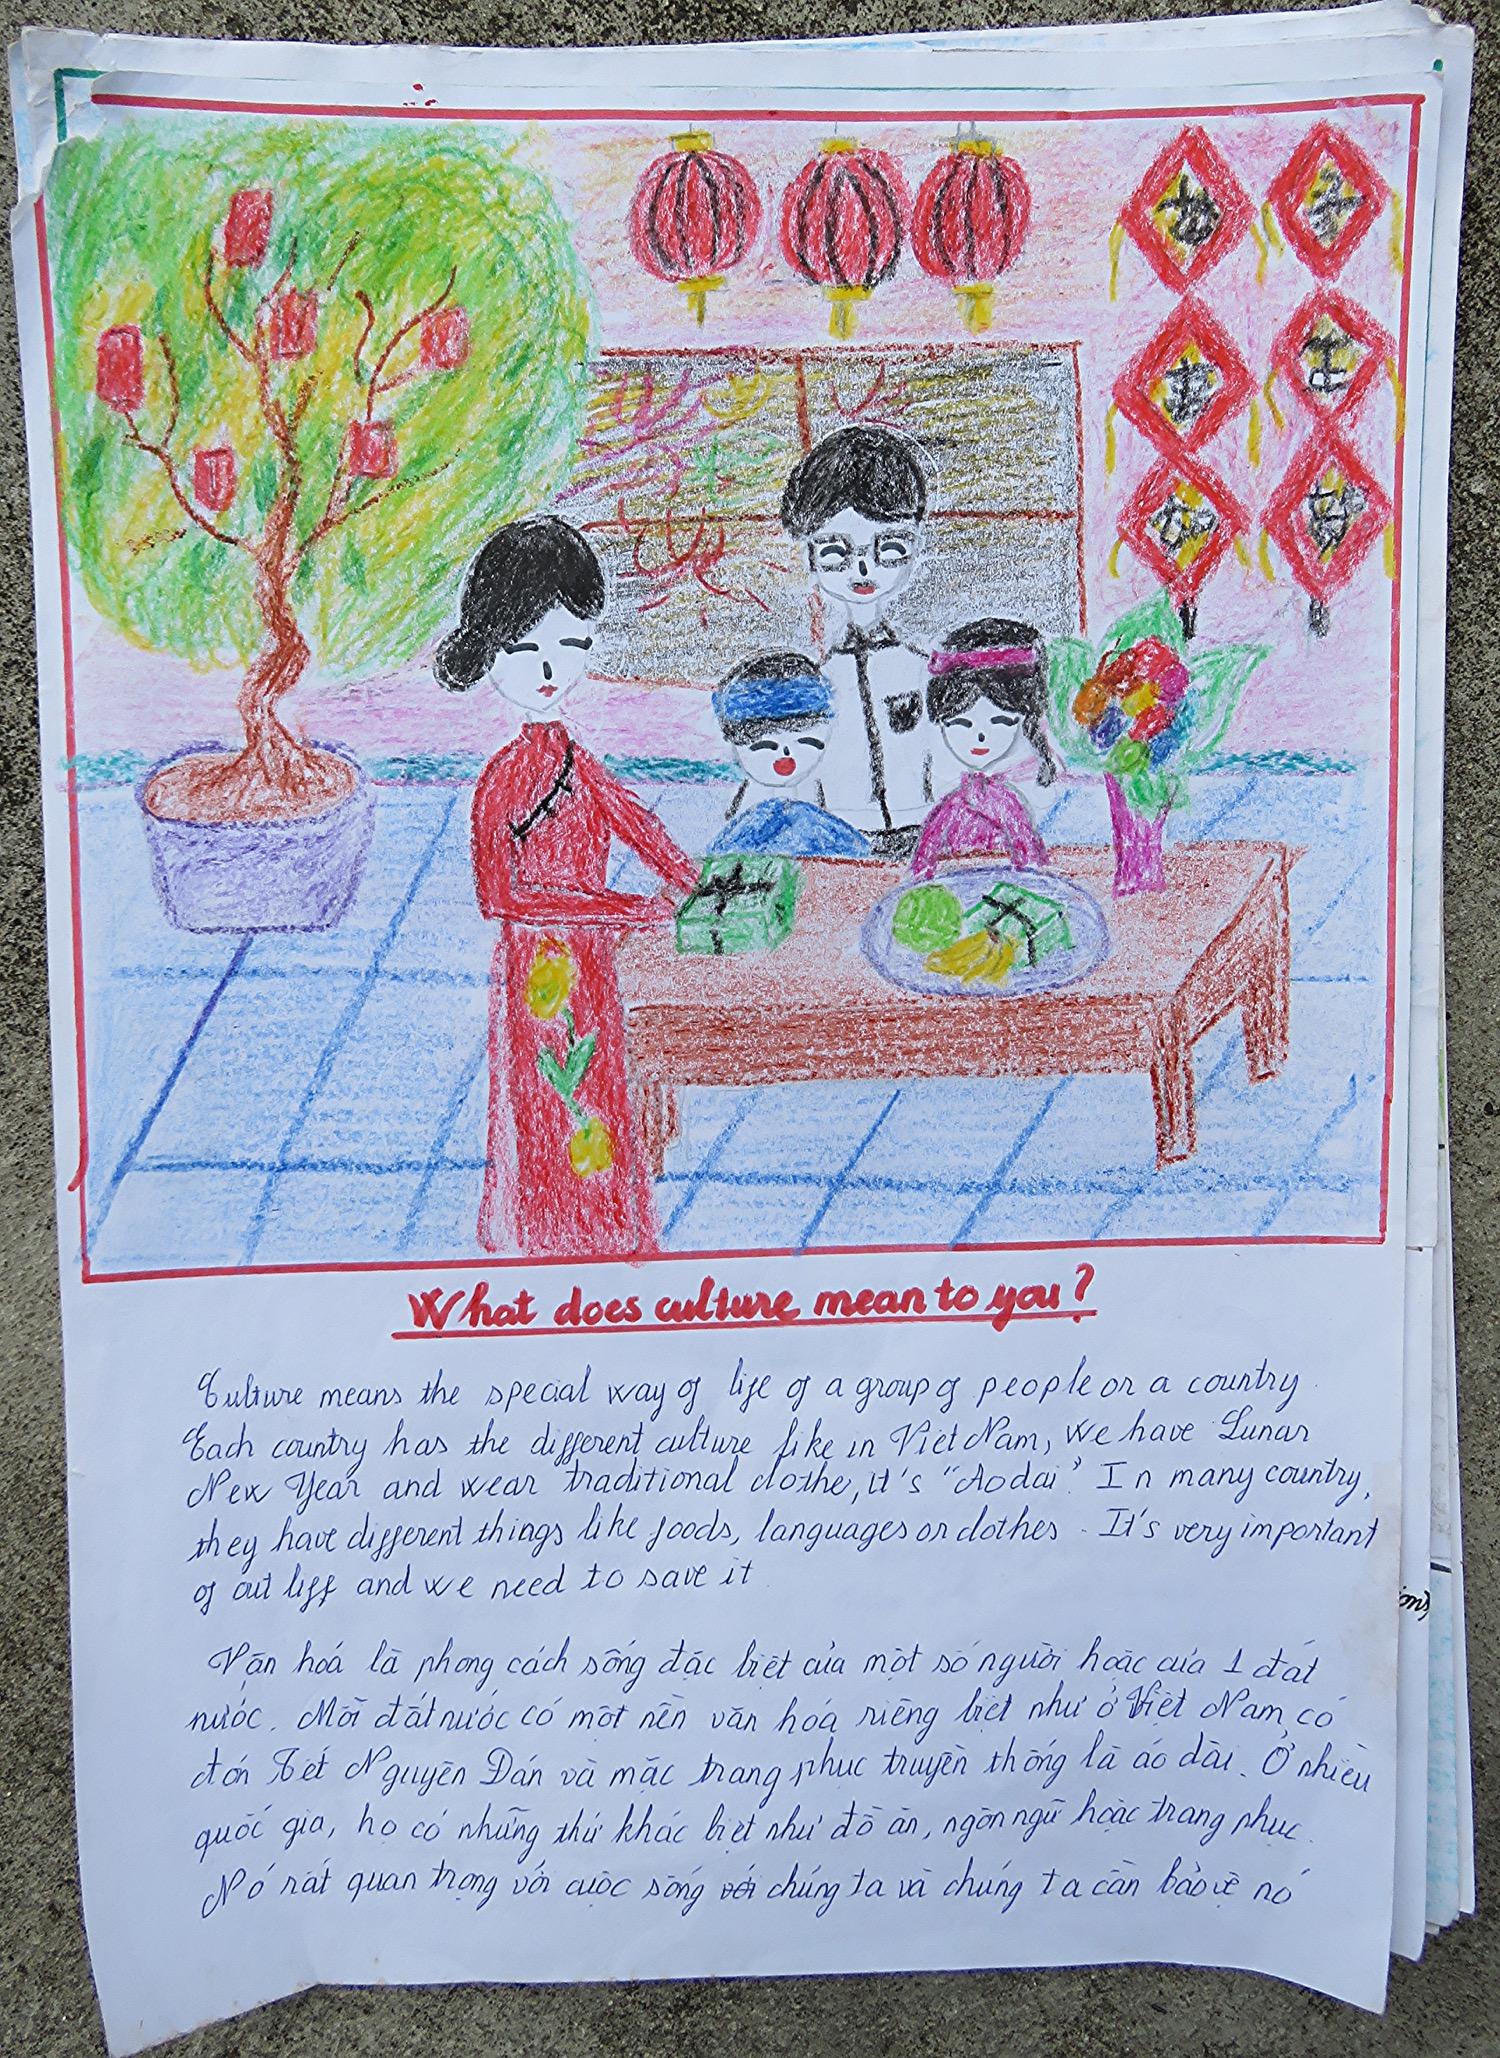 My (14) - Khe Sanh, Vietnam